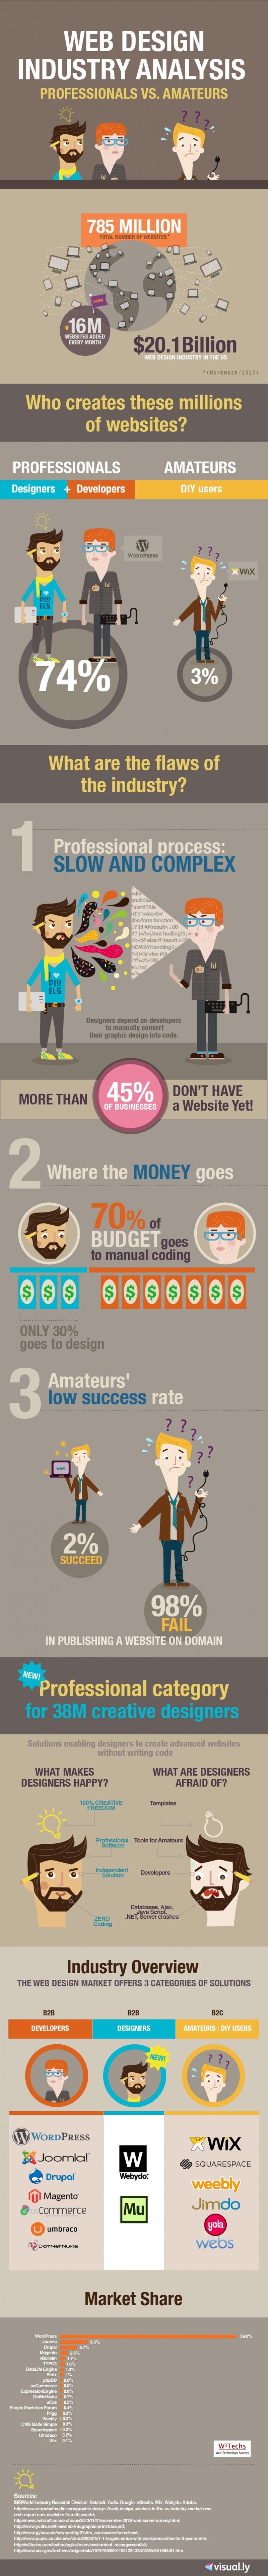 Web-design-industry-analysis-professionals-vs-amateurs